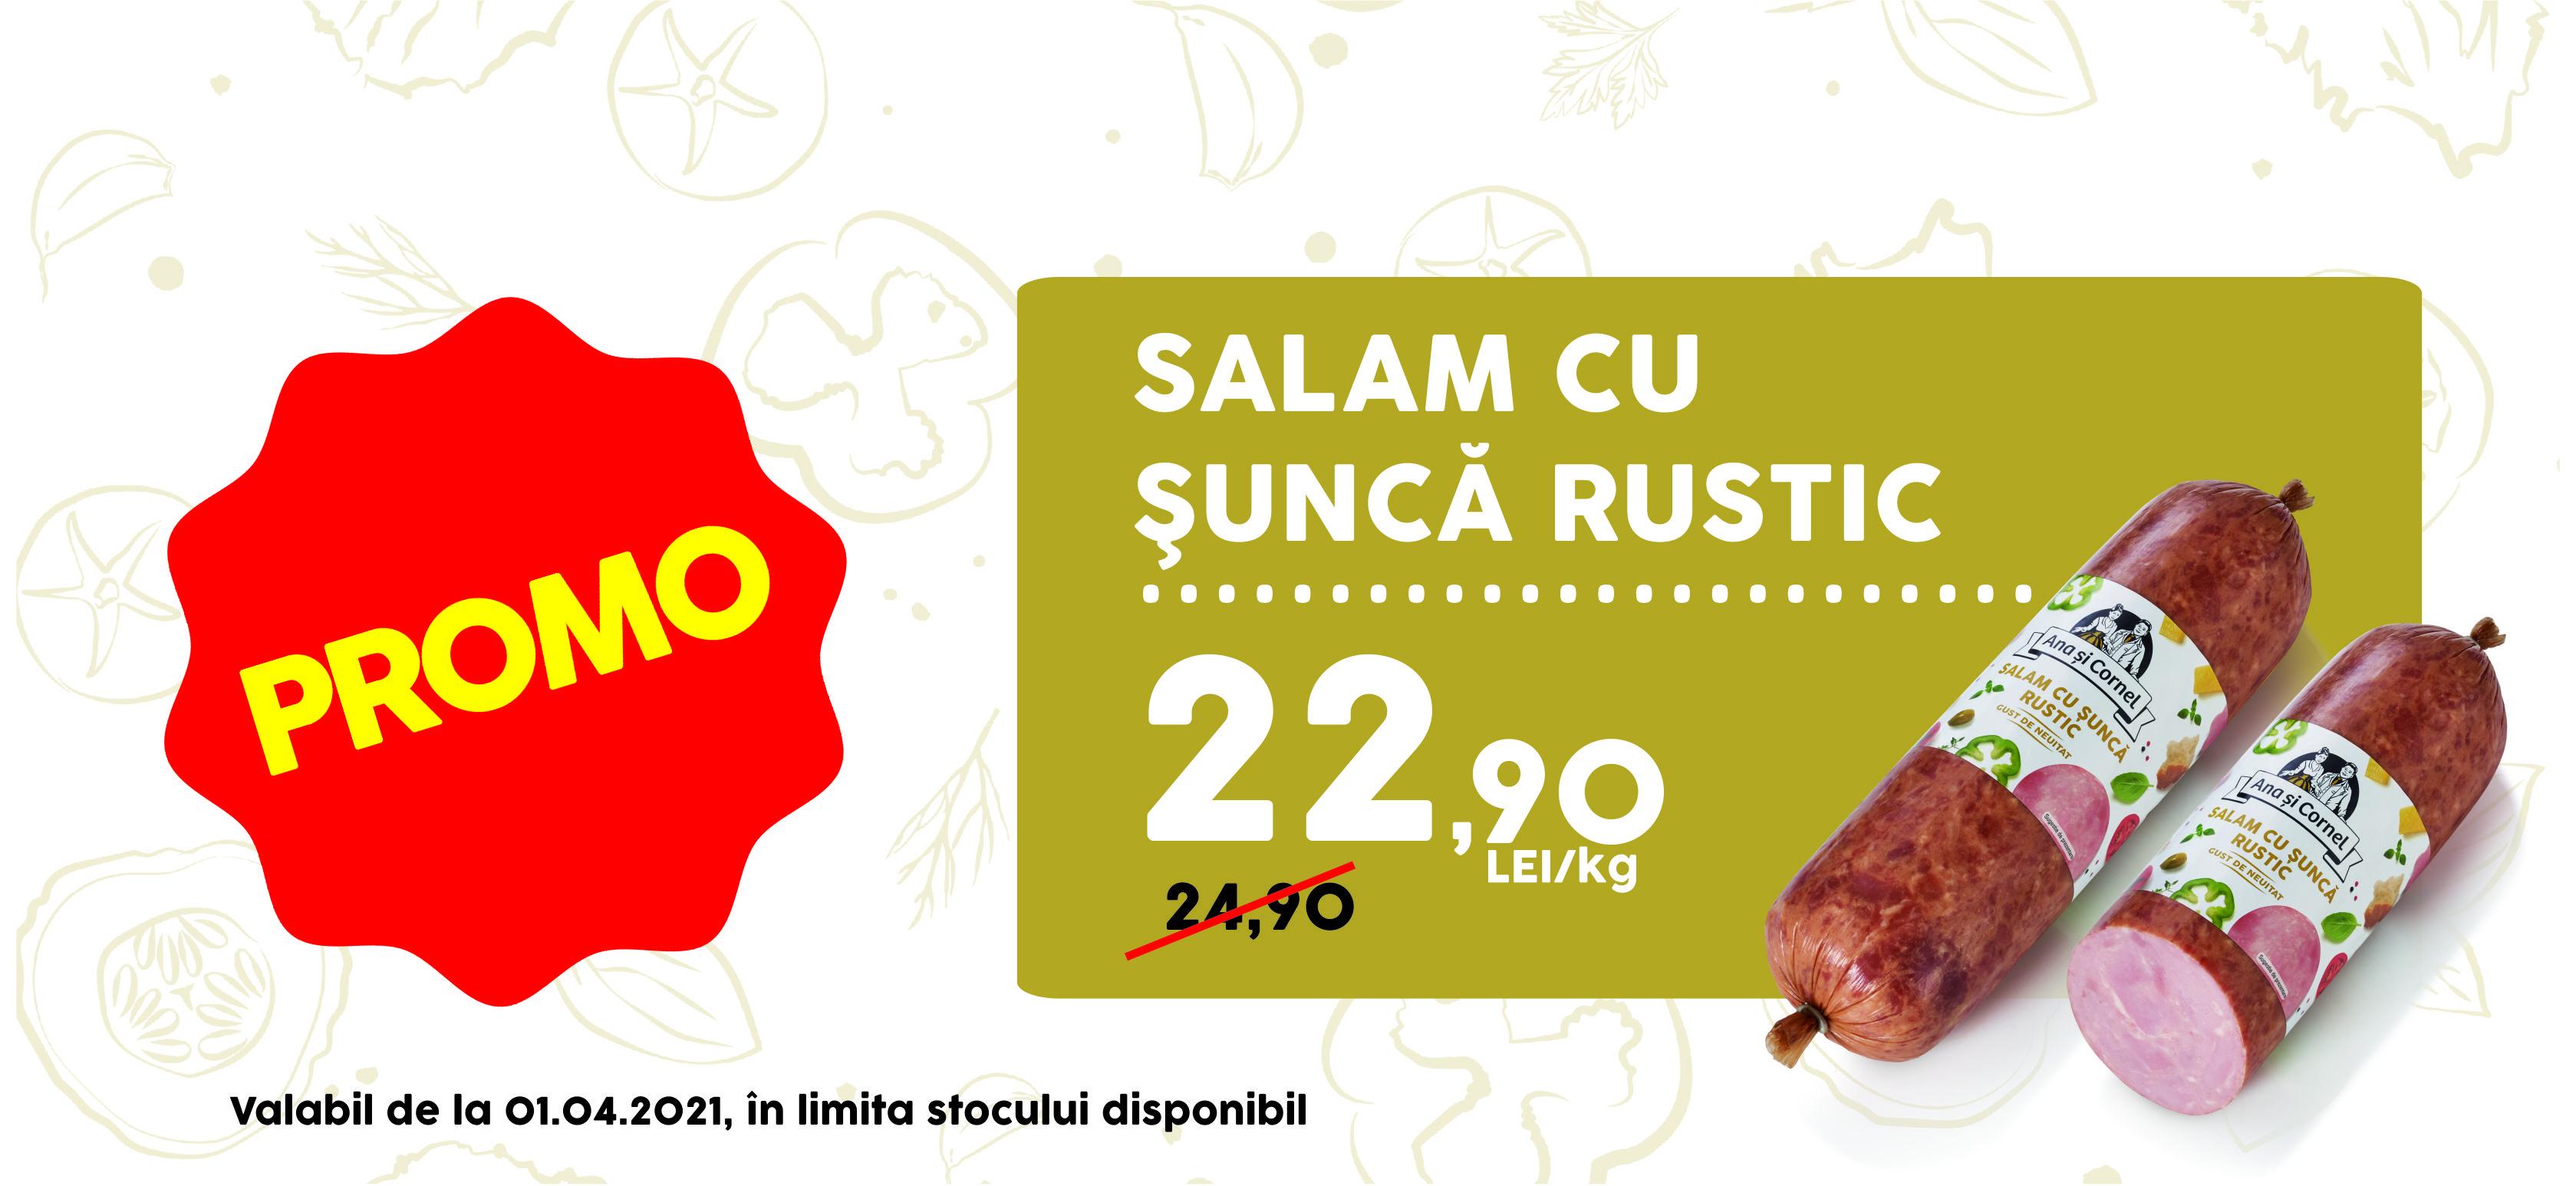 SALAM-CU-SUNCA-RUSTIC